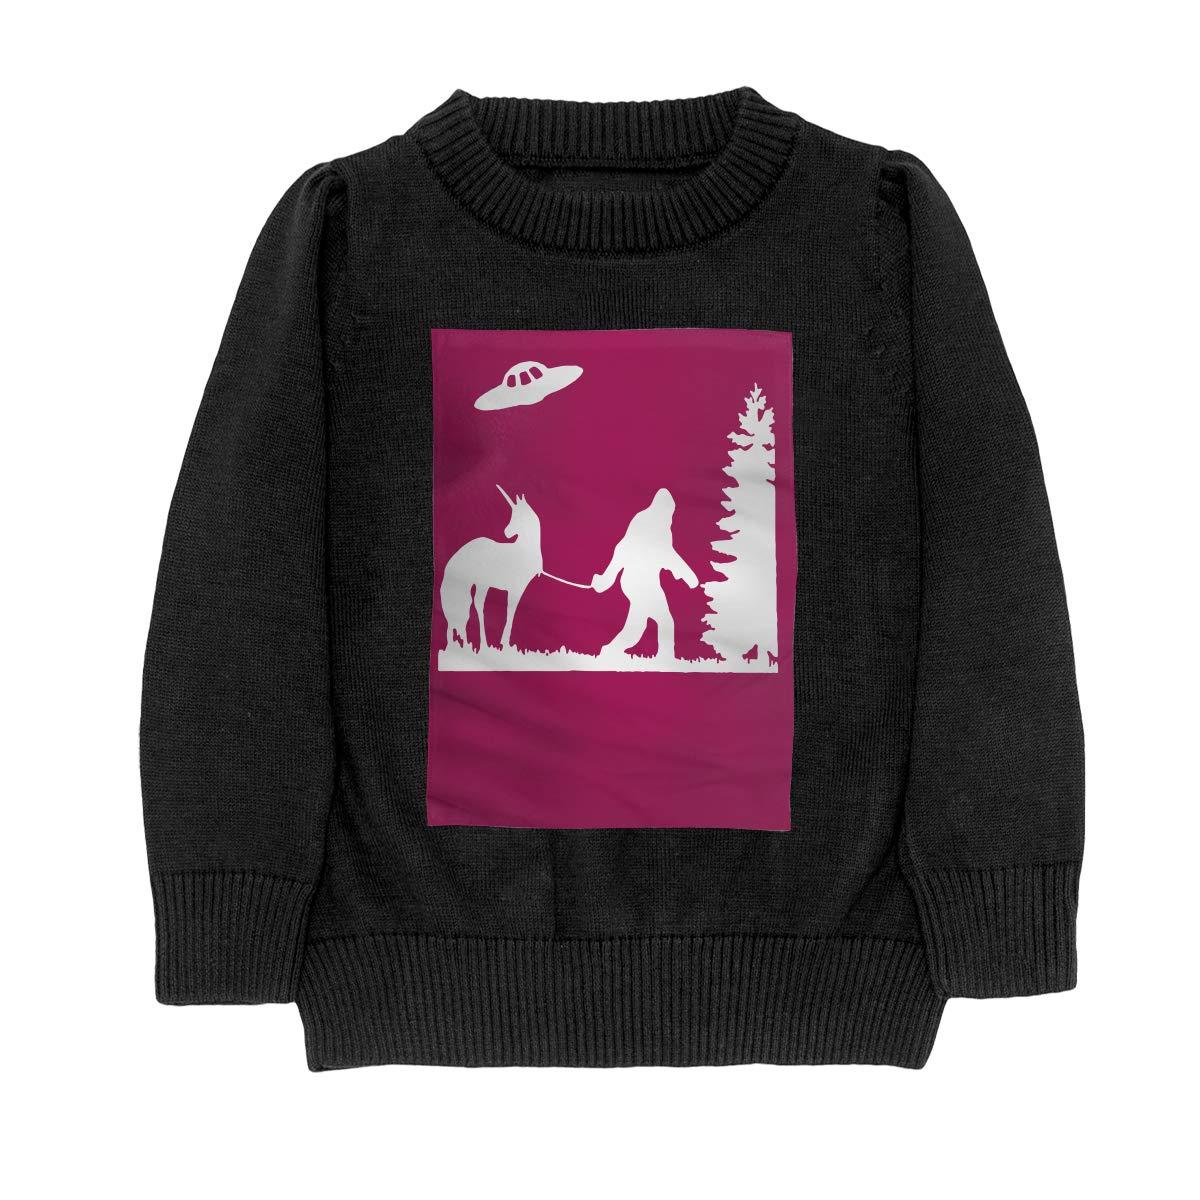 Bigfoot Leading A Unicorn with UFO Cool Adolescent Boys /& Girls Unisex Sweater Keep Warm